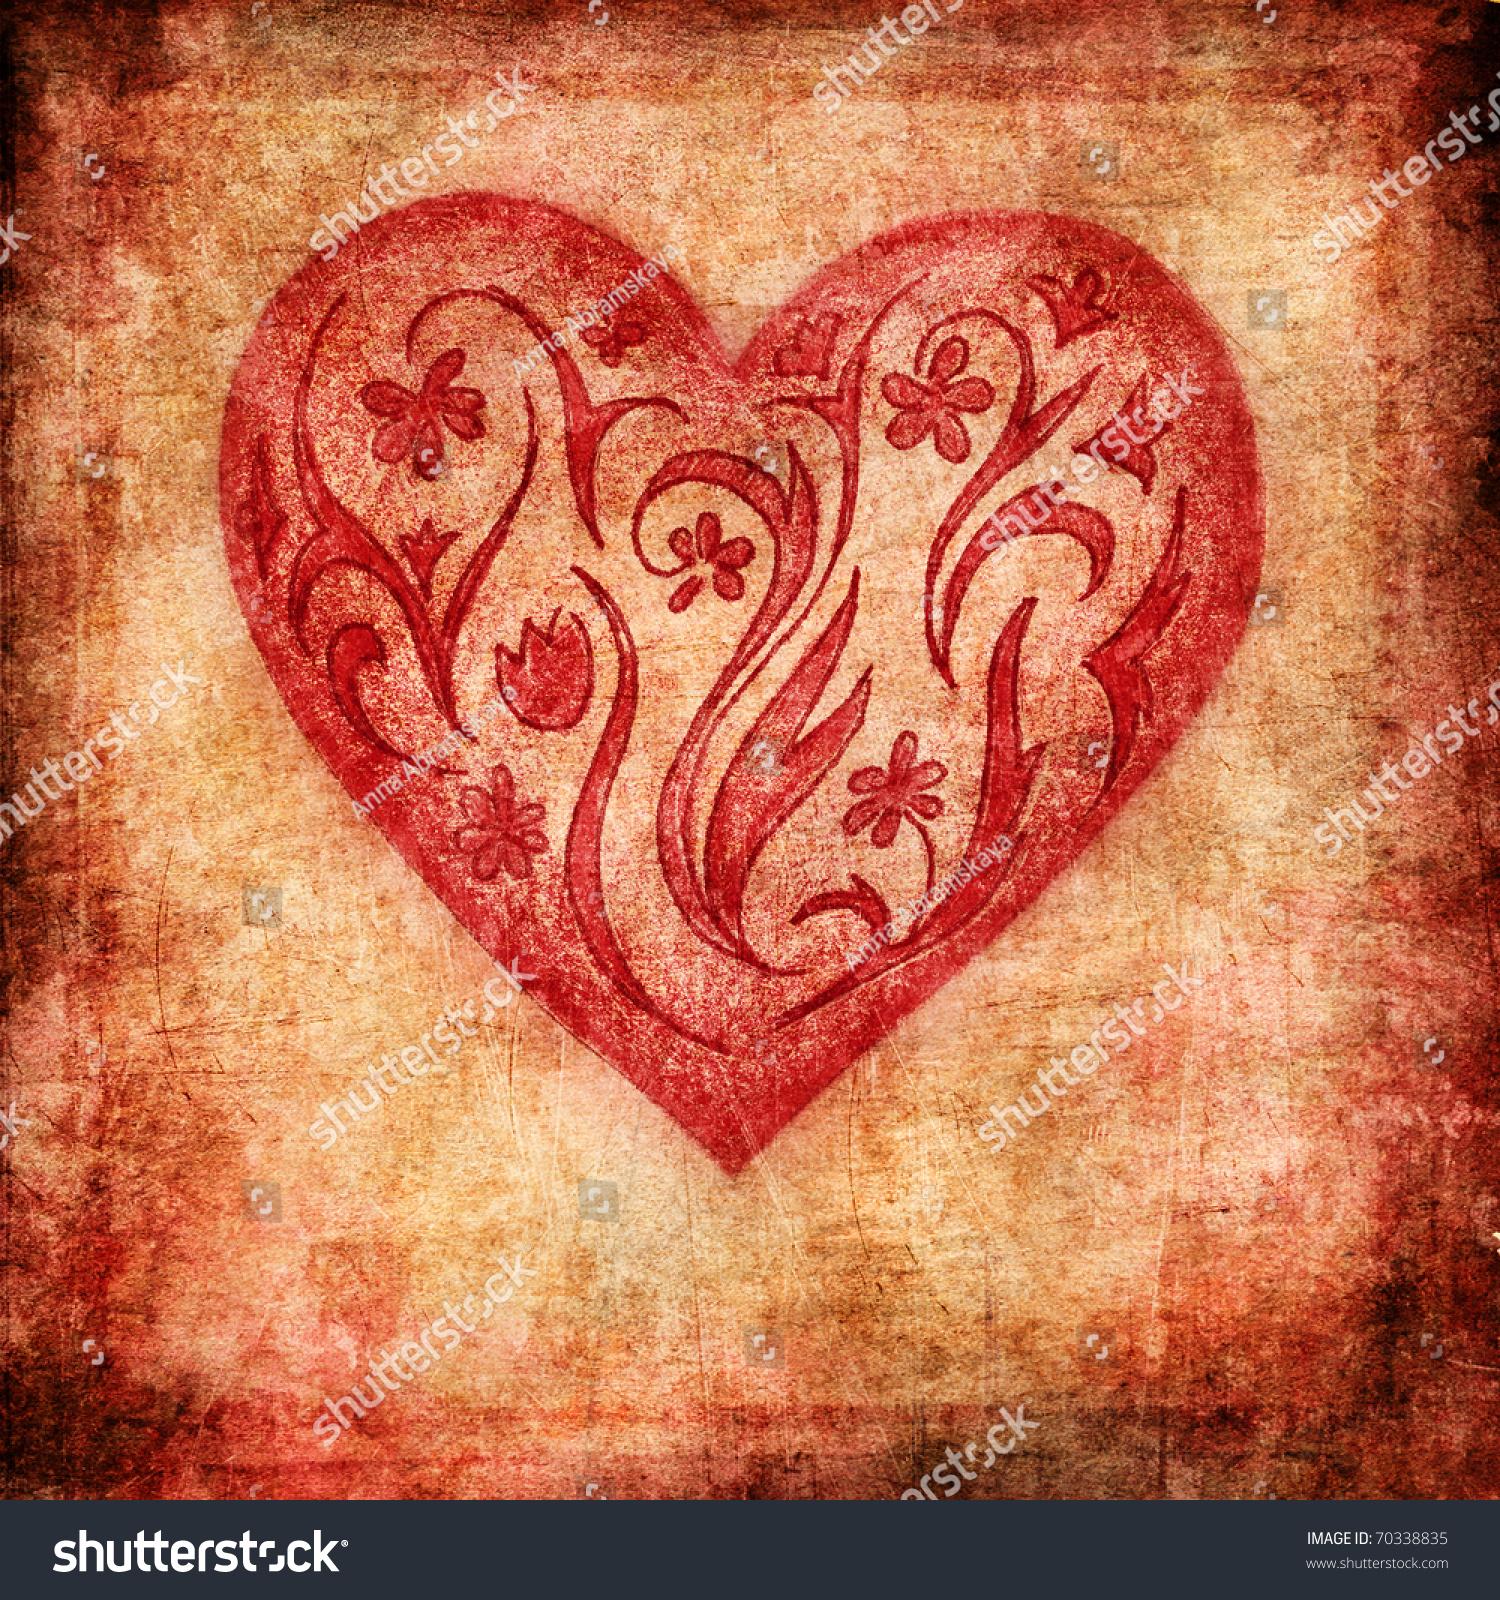 Vintage Heart Background Vintage Valenti...